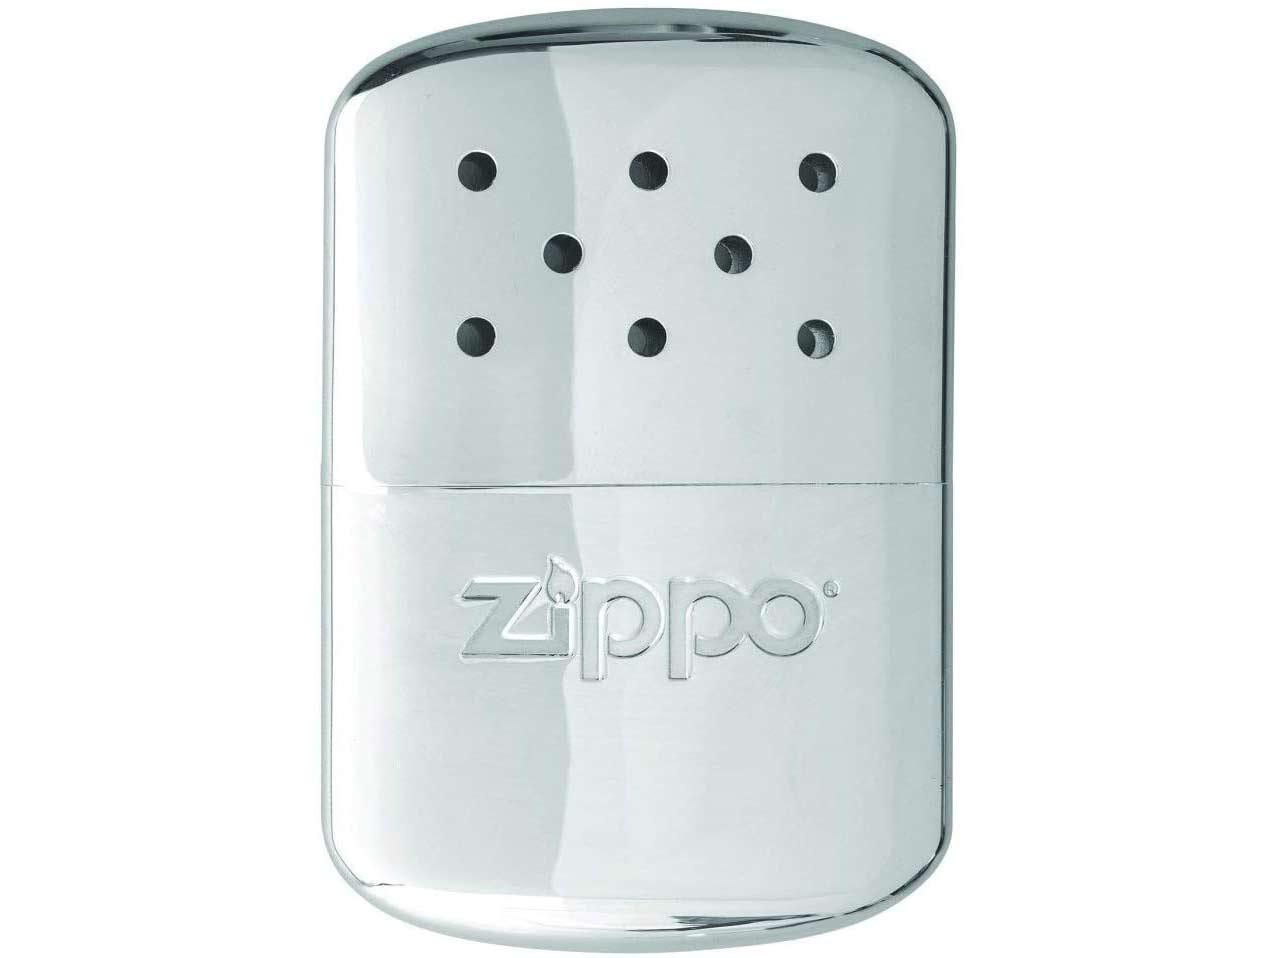 Zippo Refillable Hand Warmer